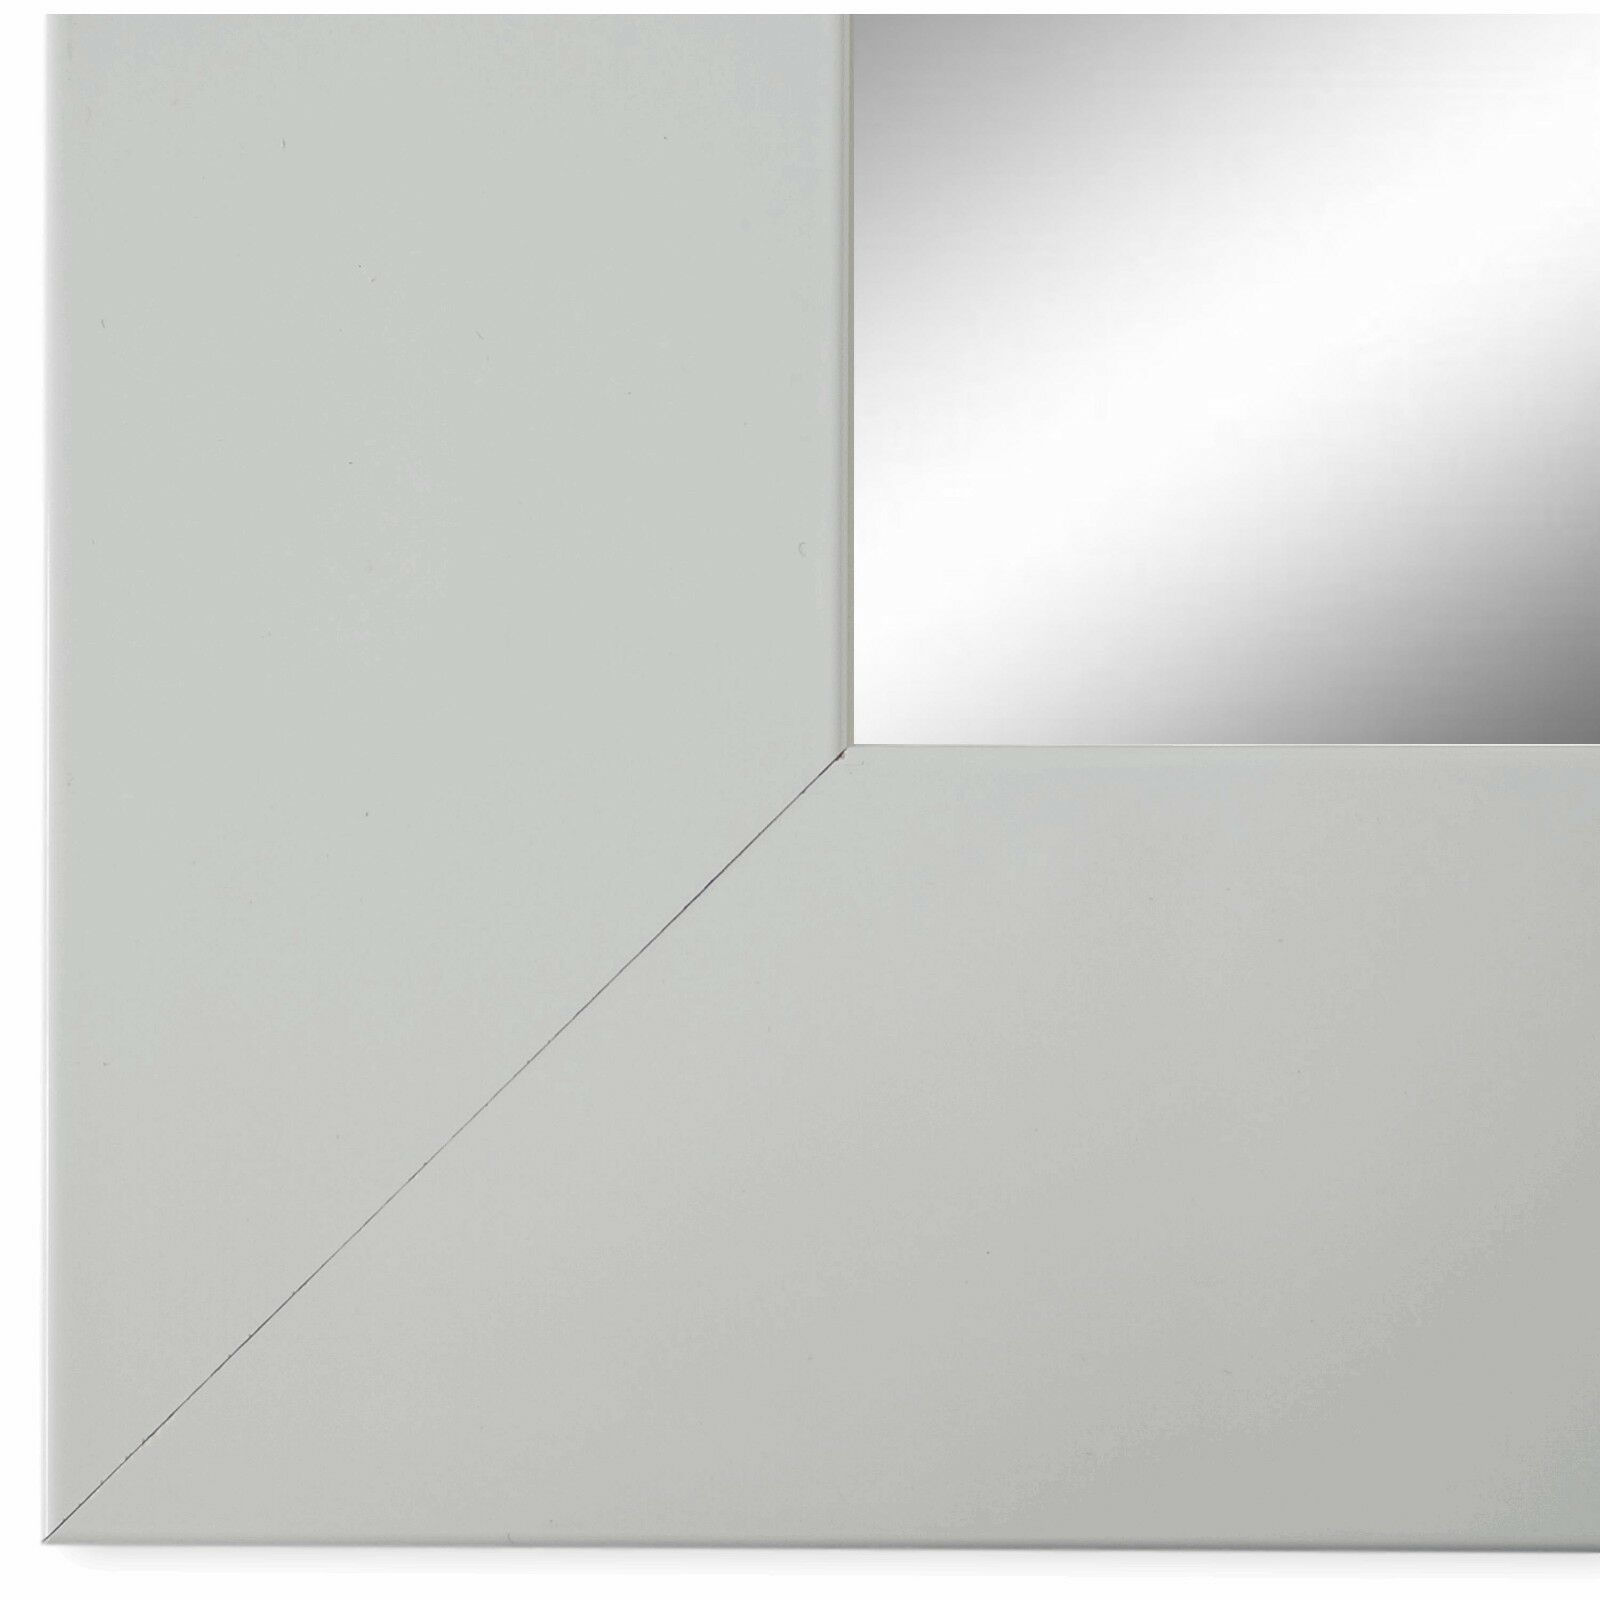 Wandspiegel Spiegel matt Weiss Vintage Retro Holz Novara 7, 0 - NEU alle  Größen